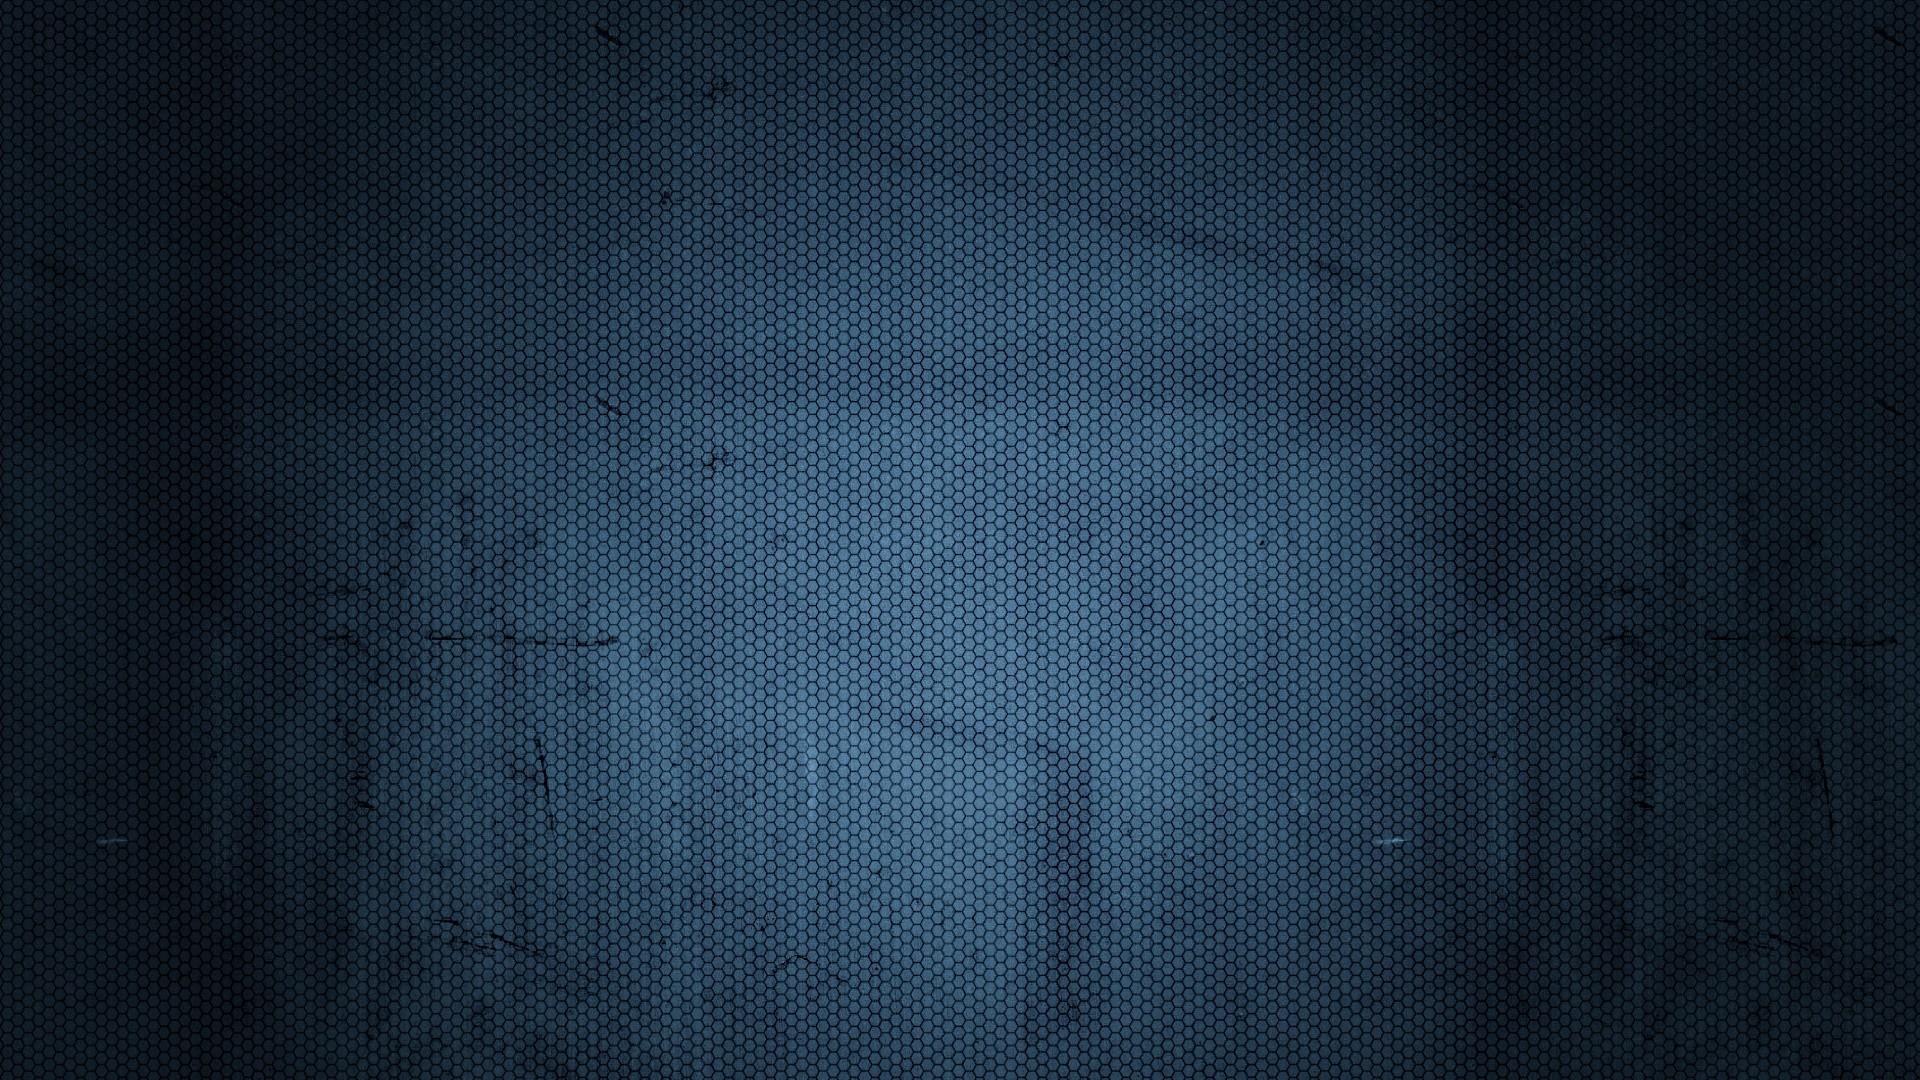 abstract, wallpapers, texture, dark, blue, wallpaper, desktop